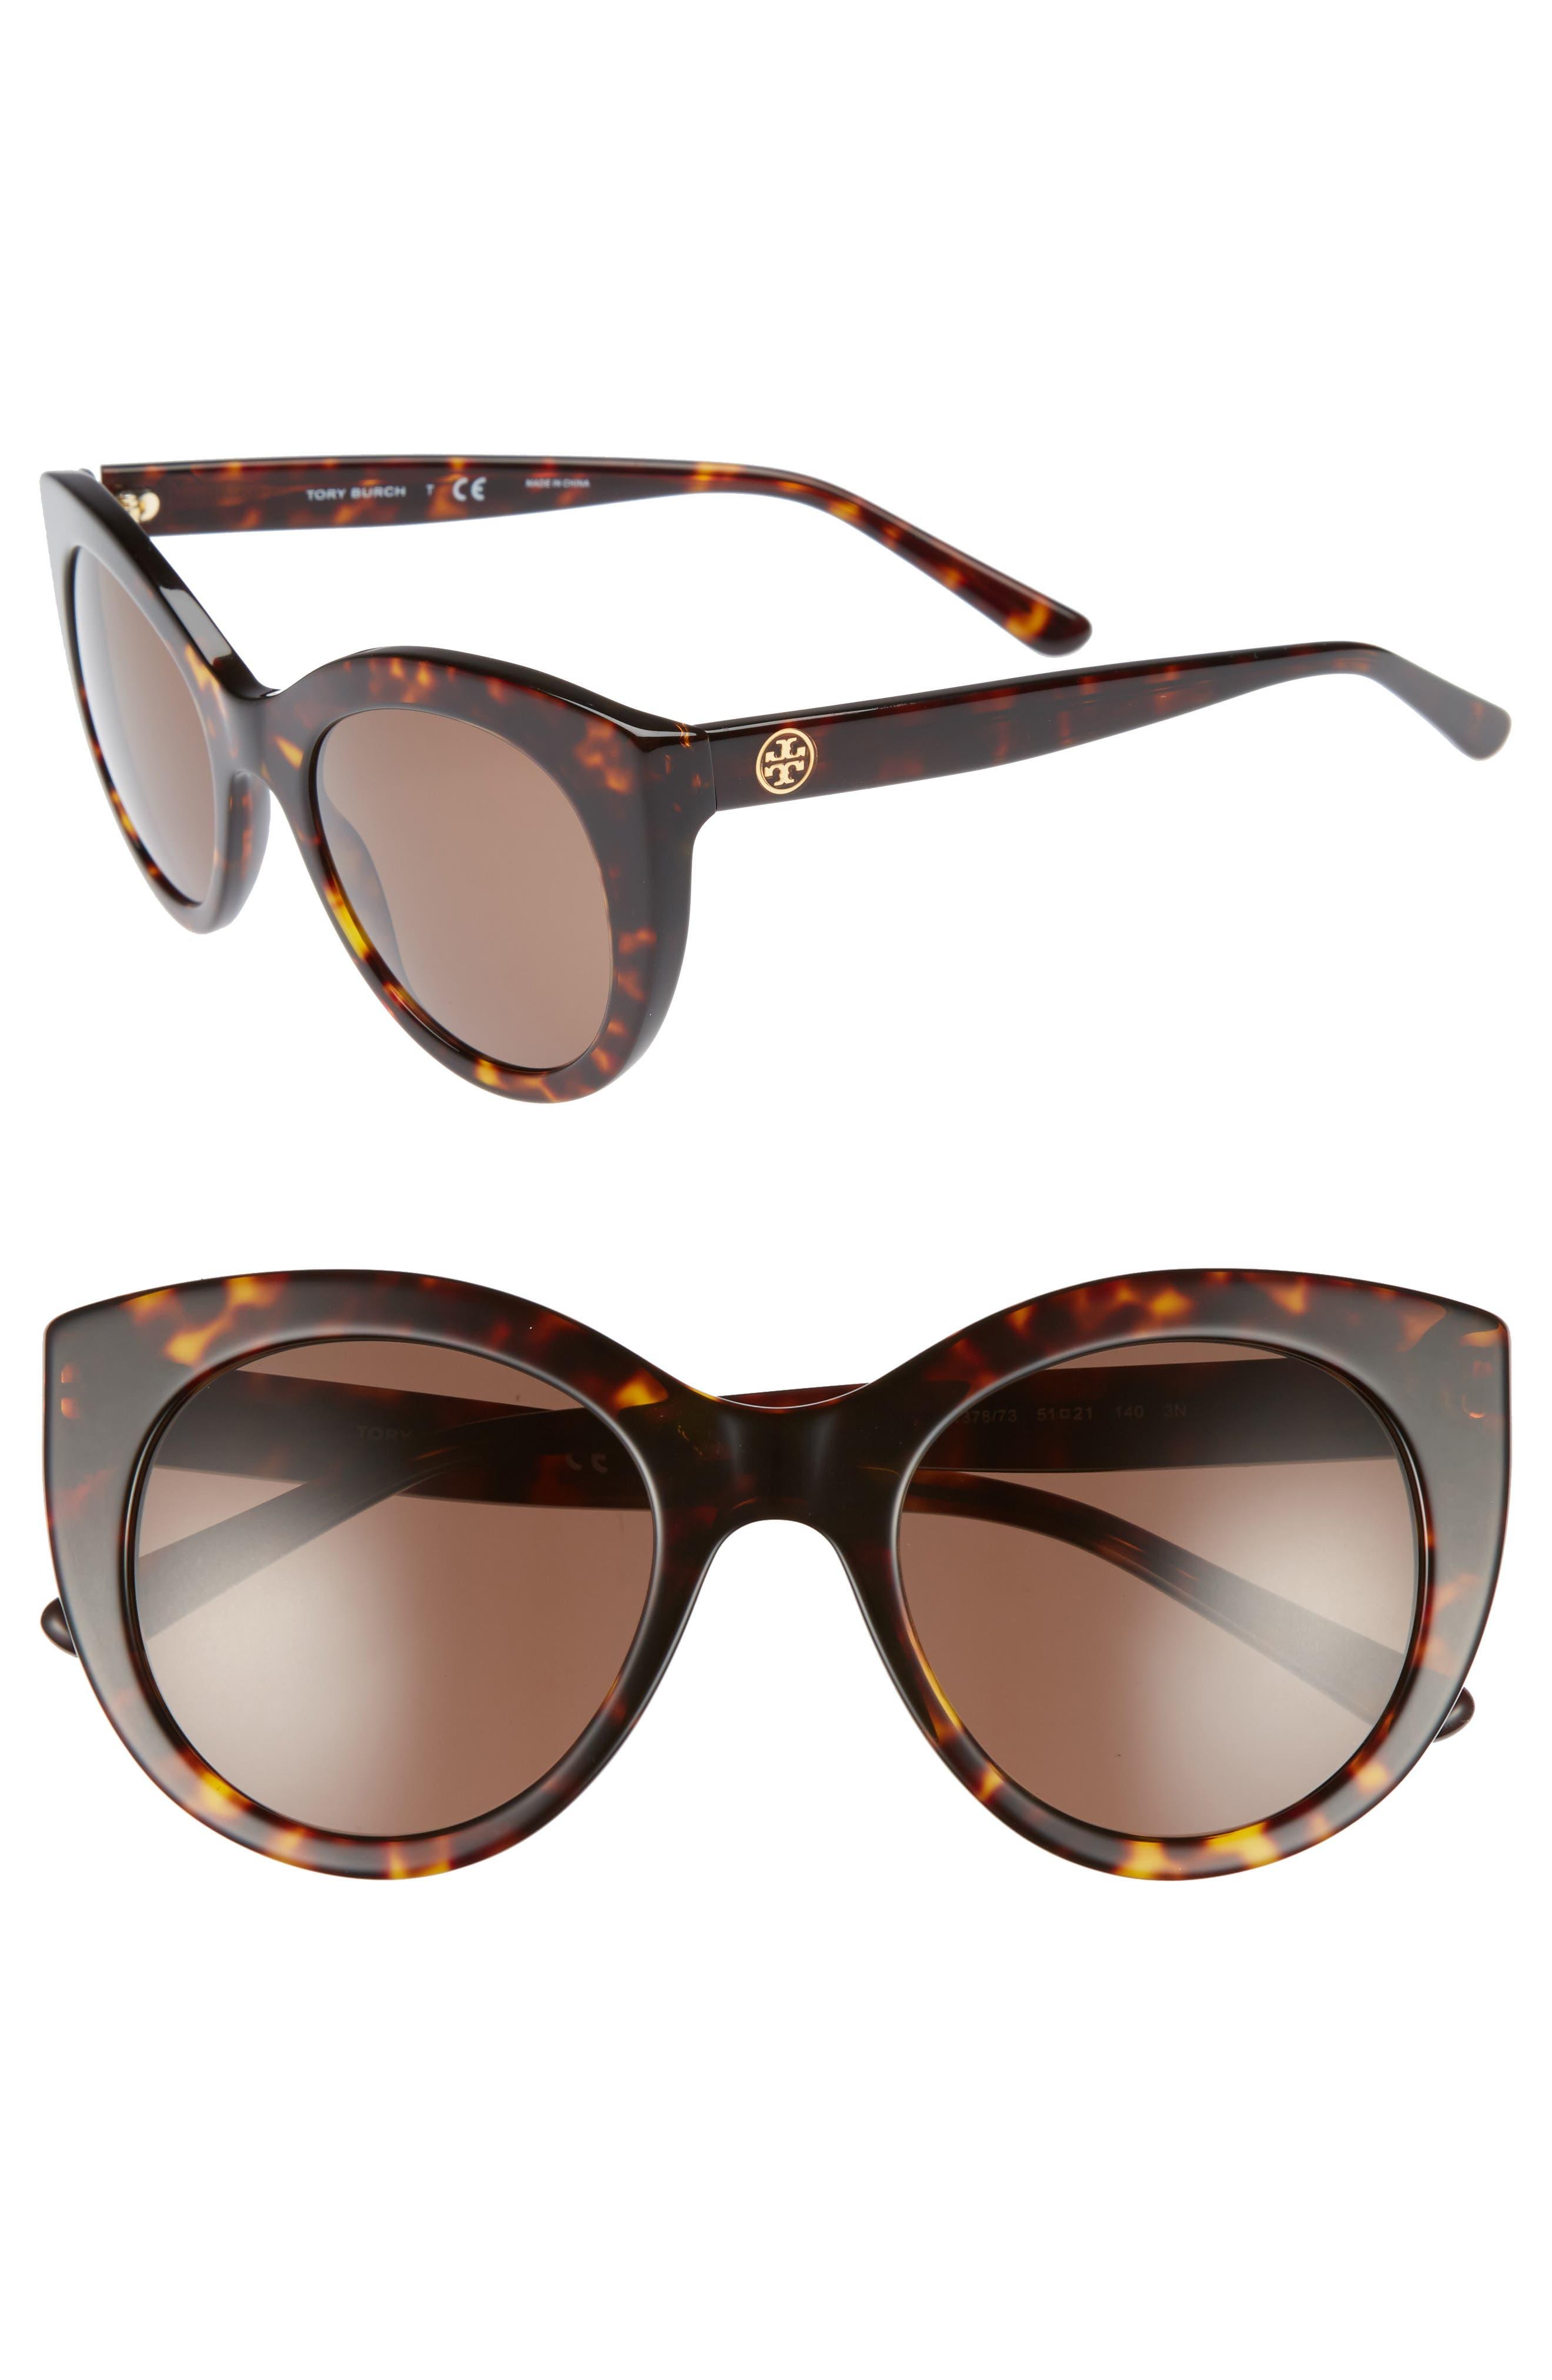 51mm Cat Eye Sunglasses,                         Main,                         color, Tortoise/ Gold